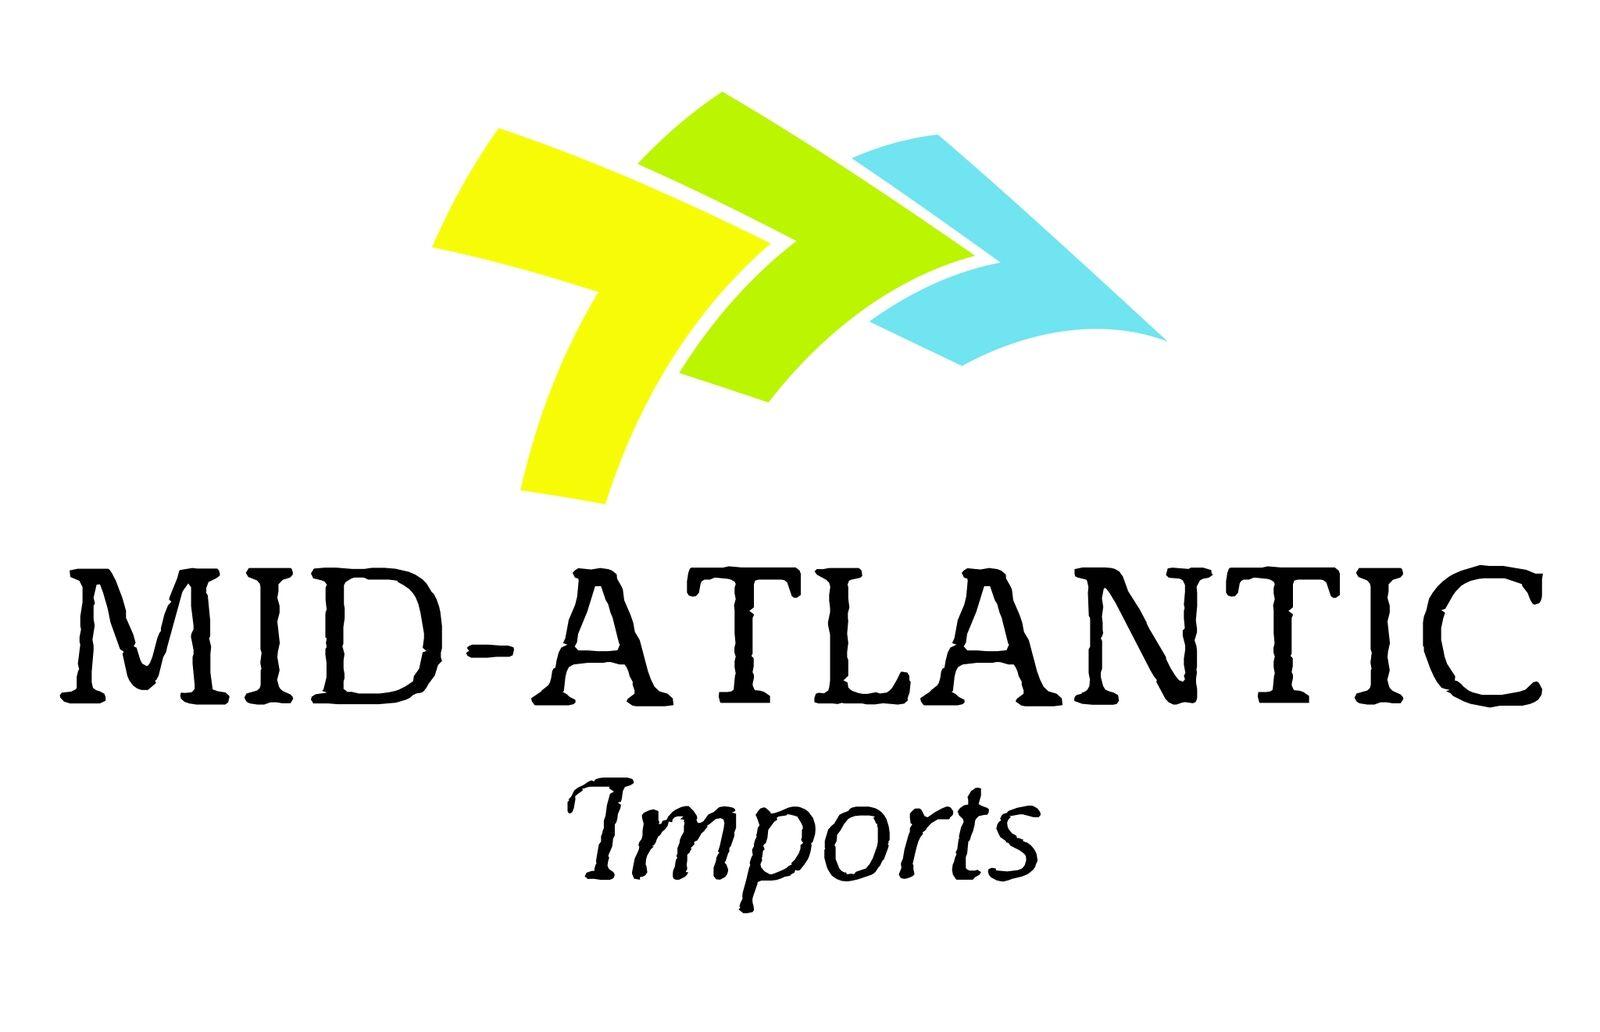 Mid-Atlantic Imports